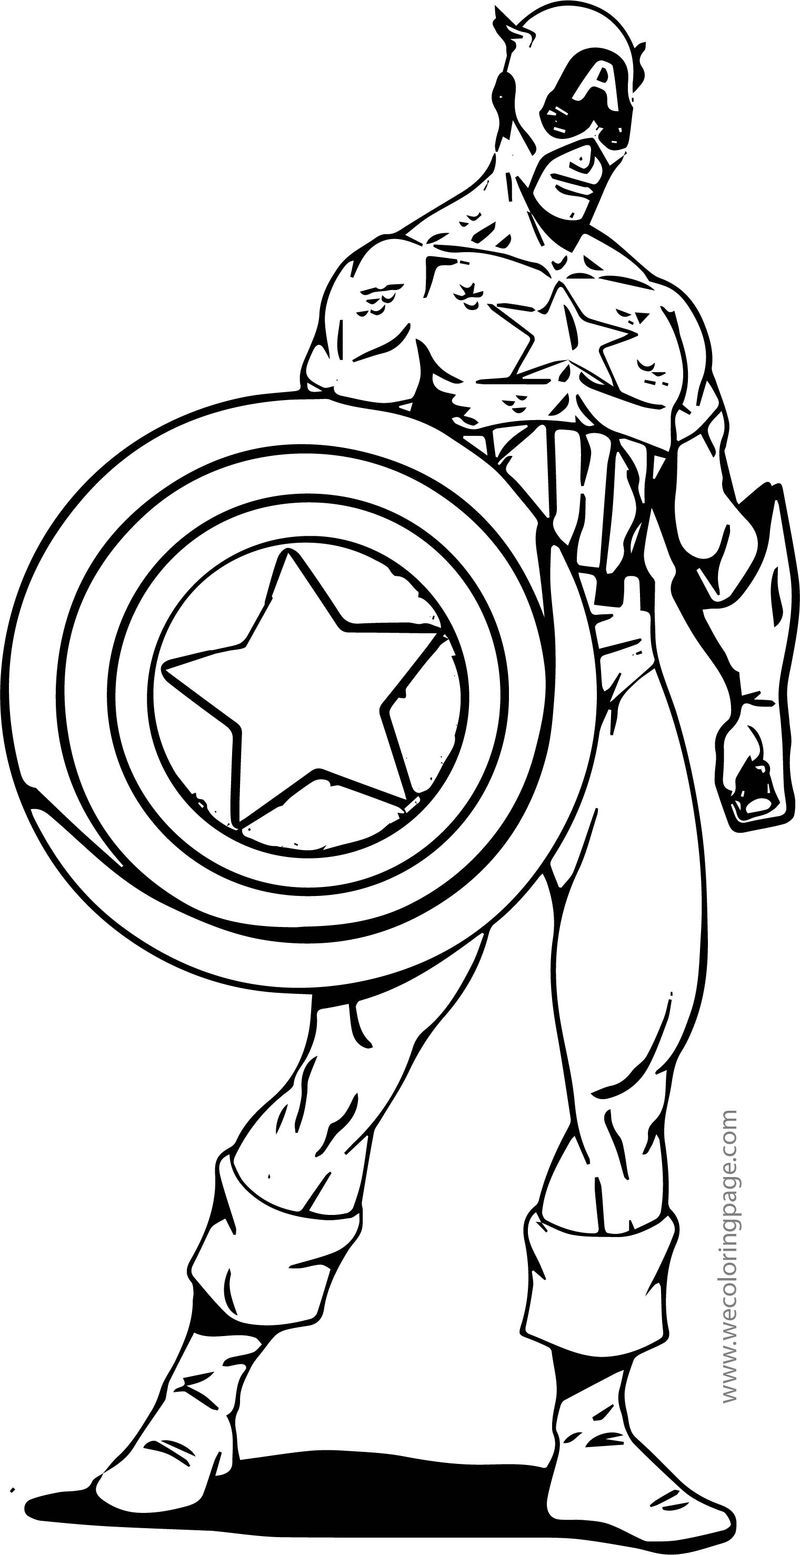 Captain America Cartoon Coloring Page 2 | Captain america ...